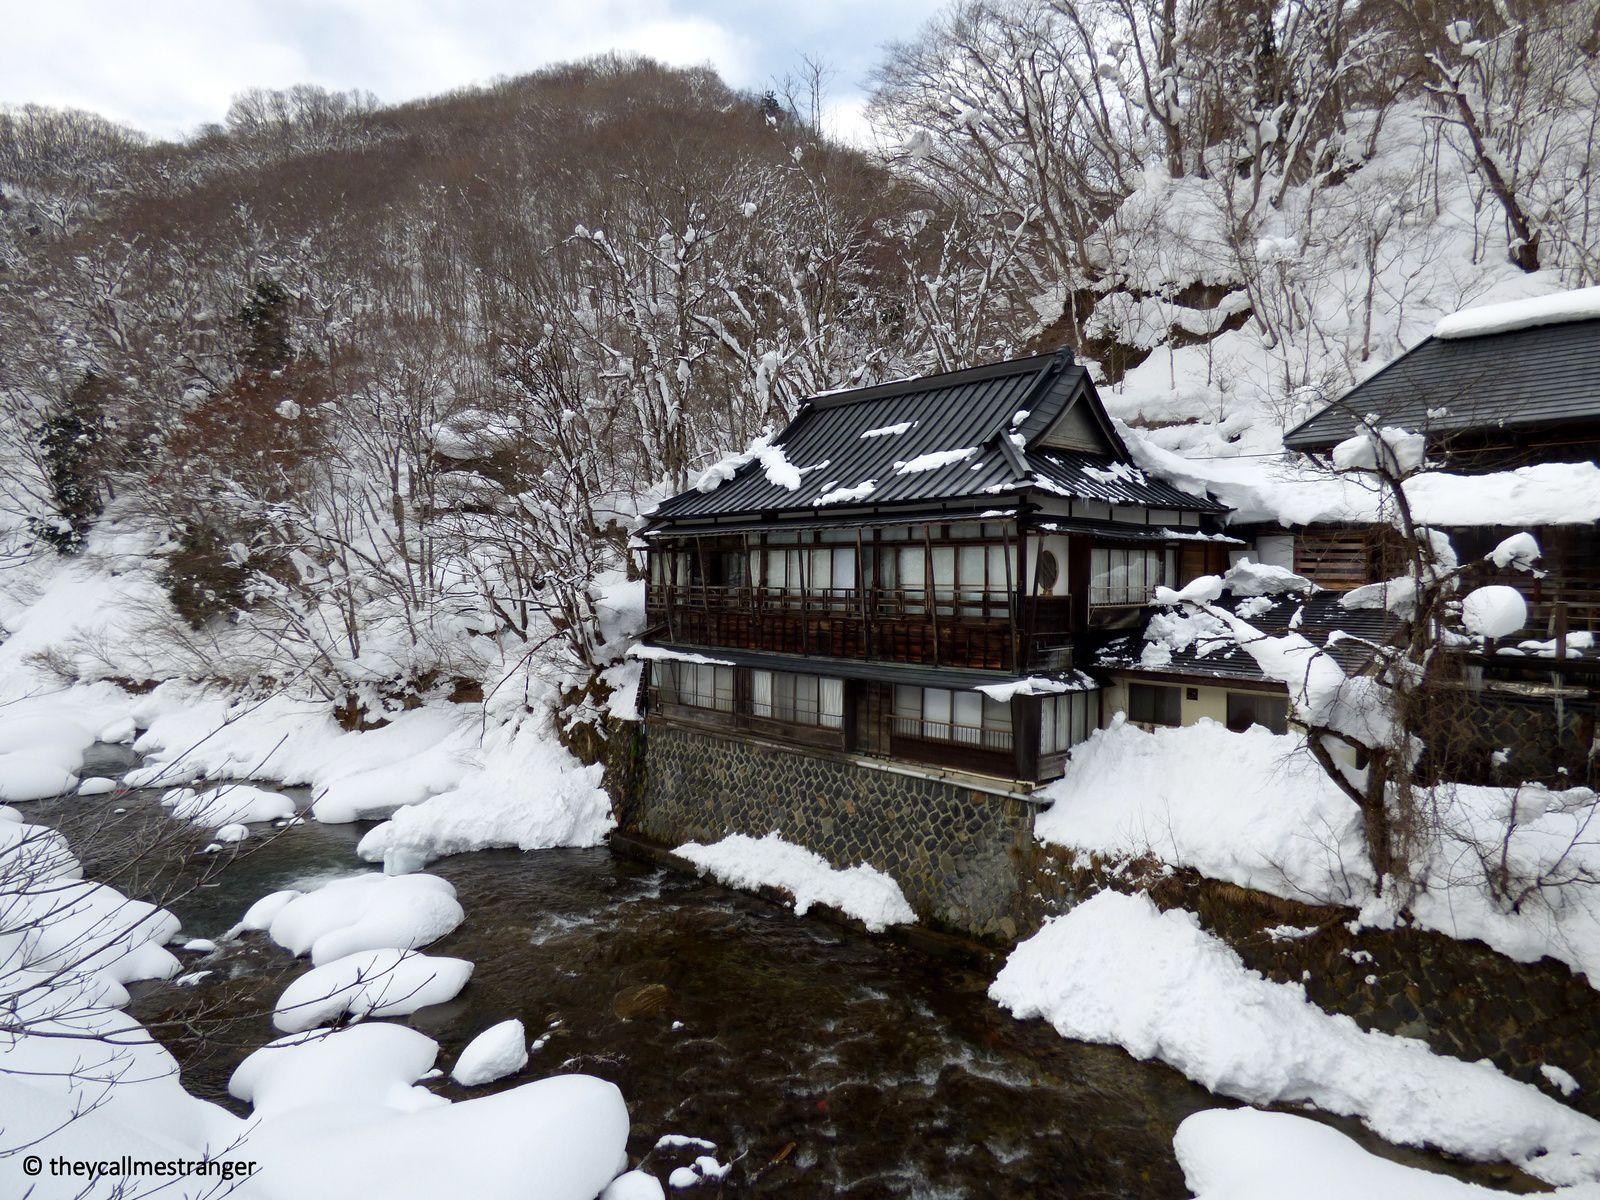 Mon expérience des sources thermales au Japon: Takaragawa Onsen